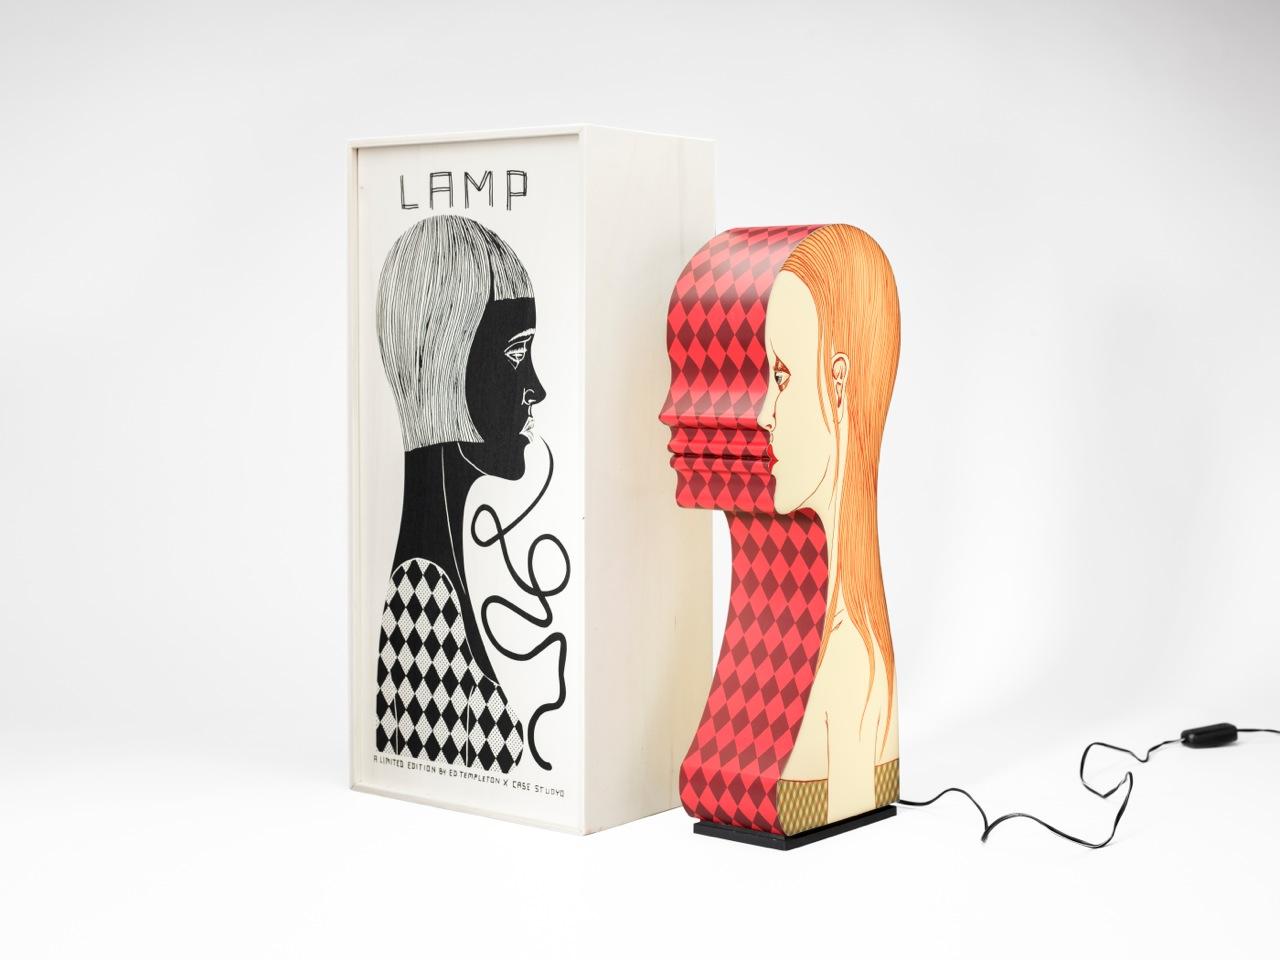 ed_templeton_lamp03